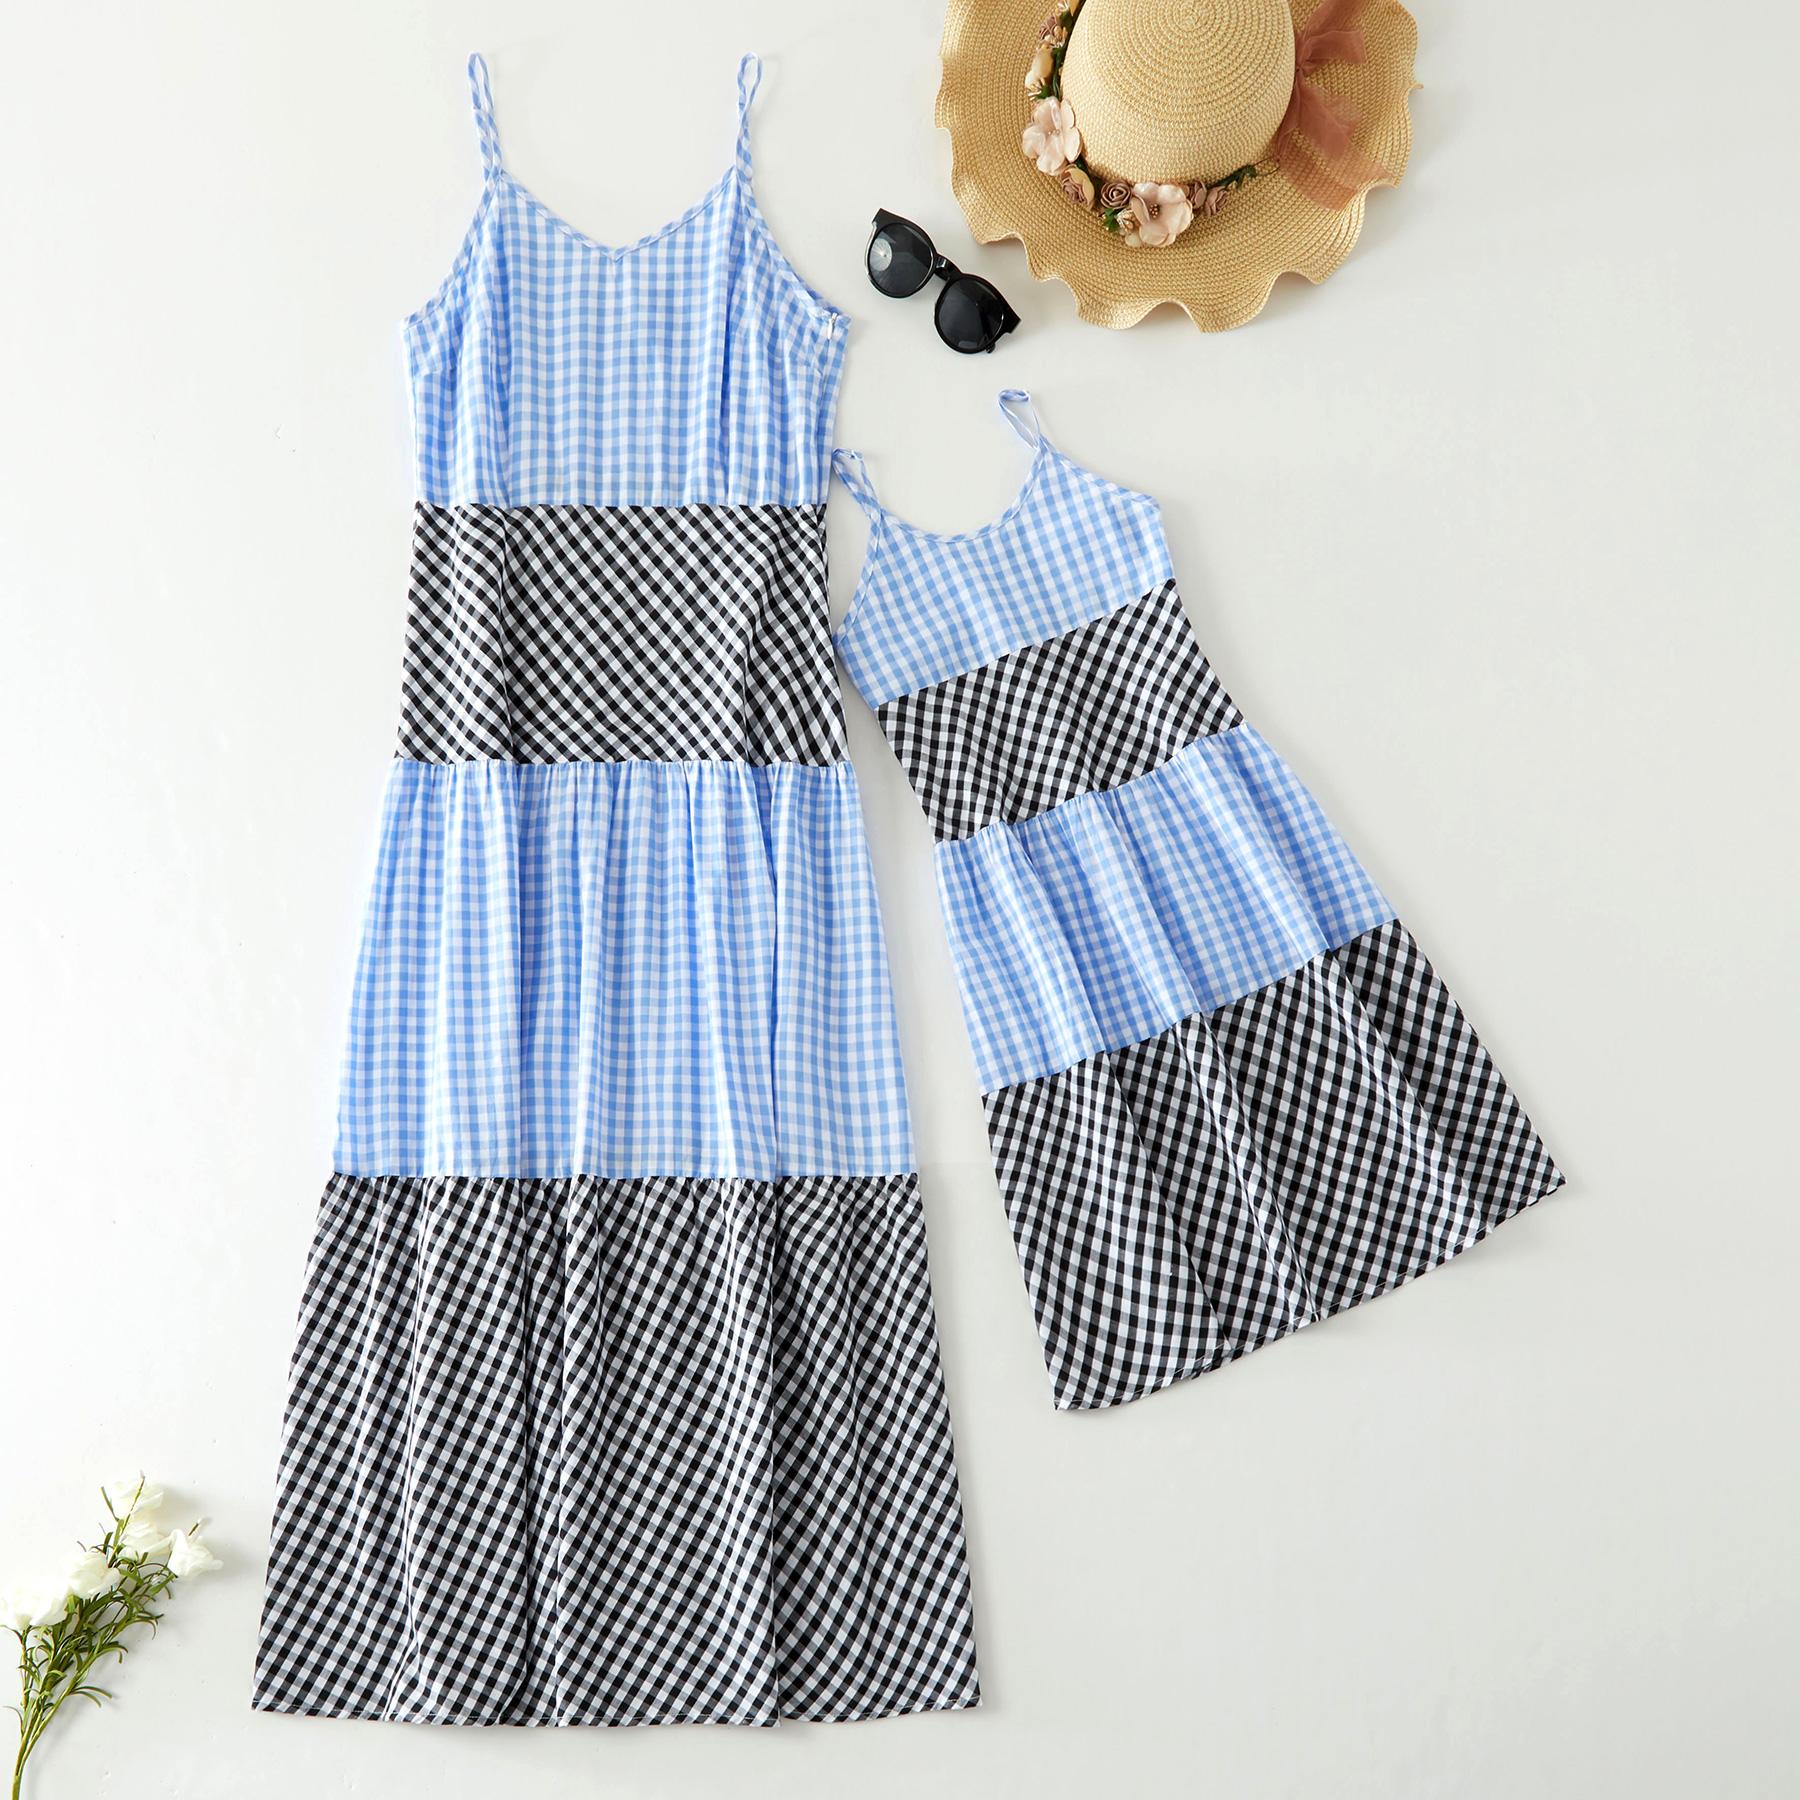 Mini Plaid Stitching Matching Dresses